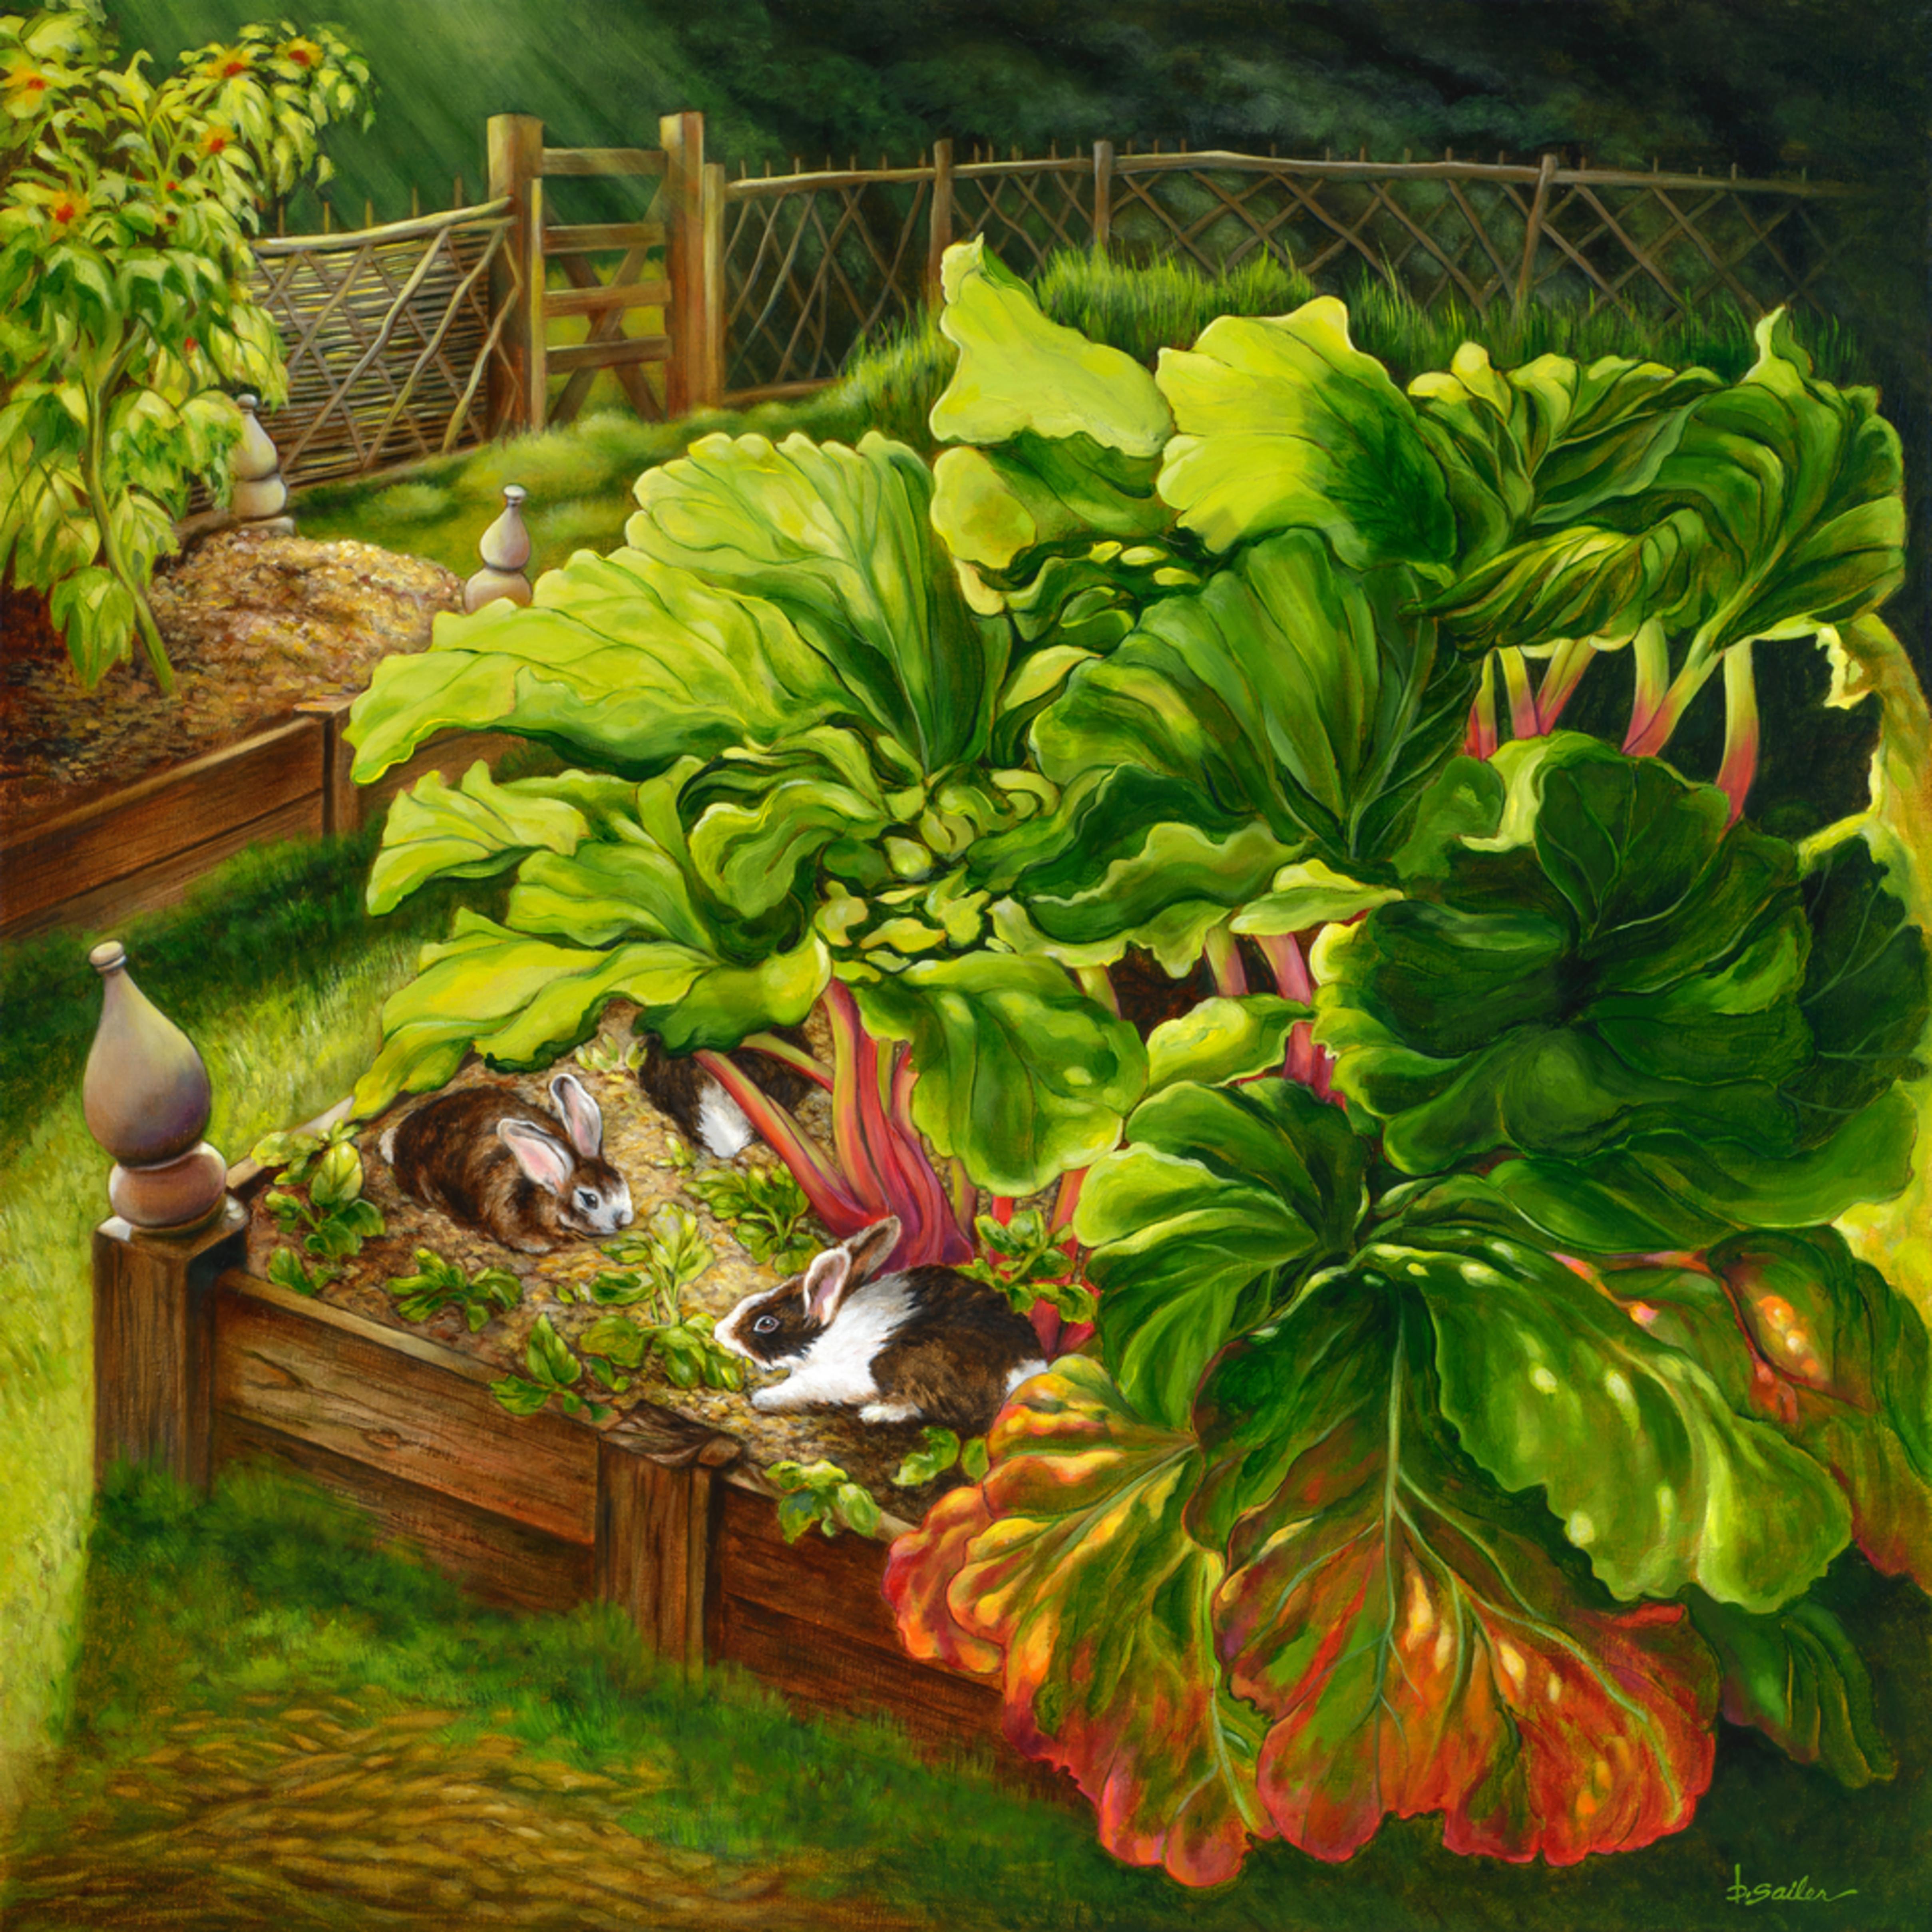 Morning feeding   rabbits and rhubarb l4qjnb